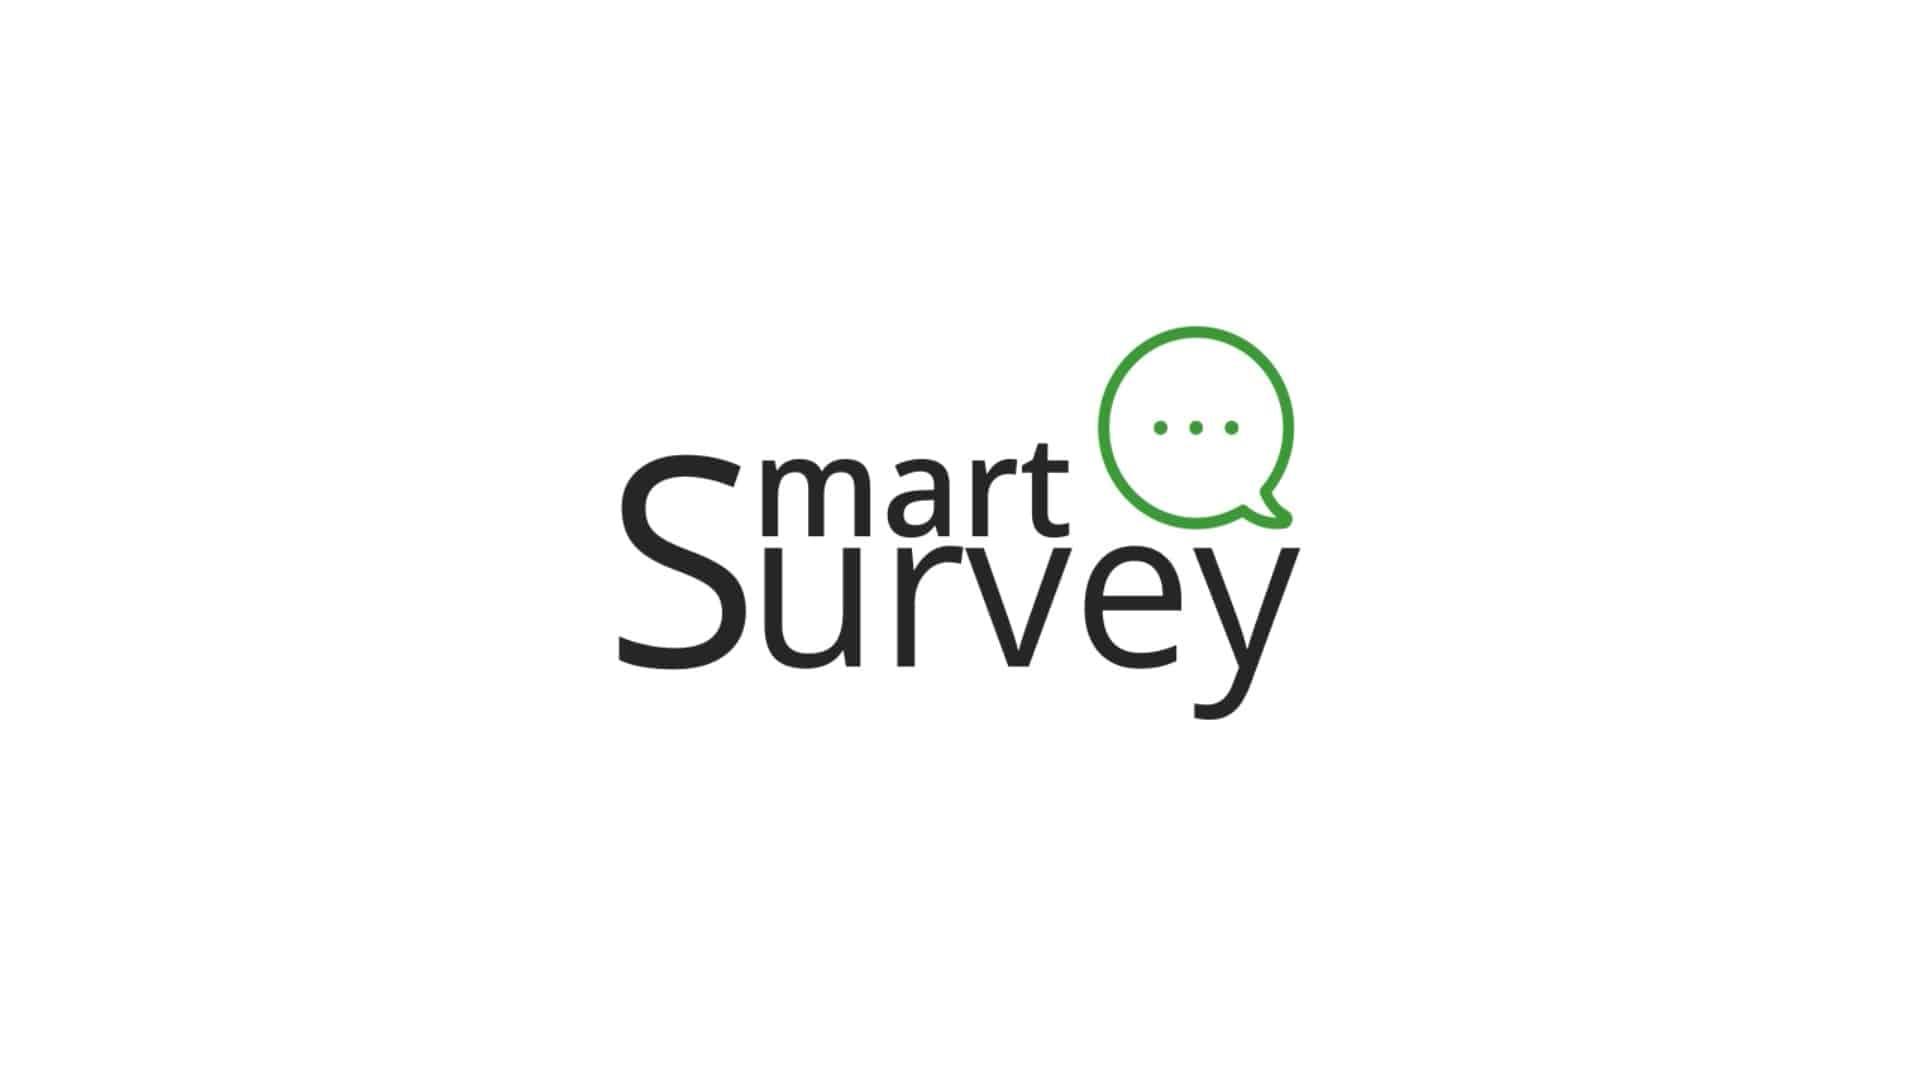 smartsurvey